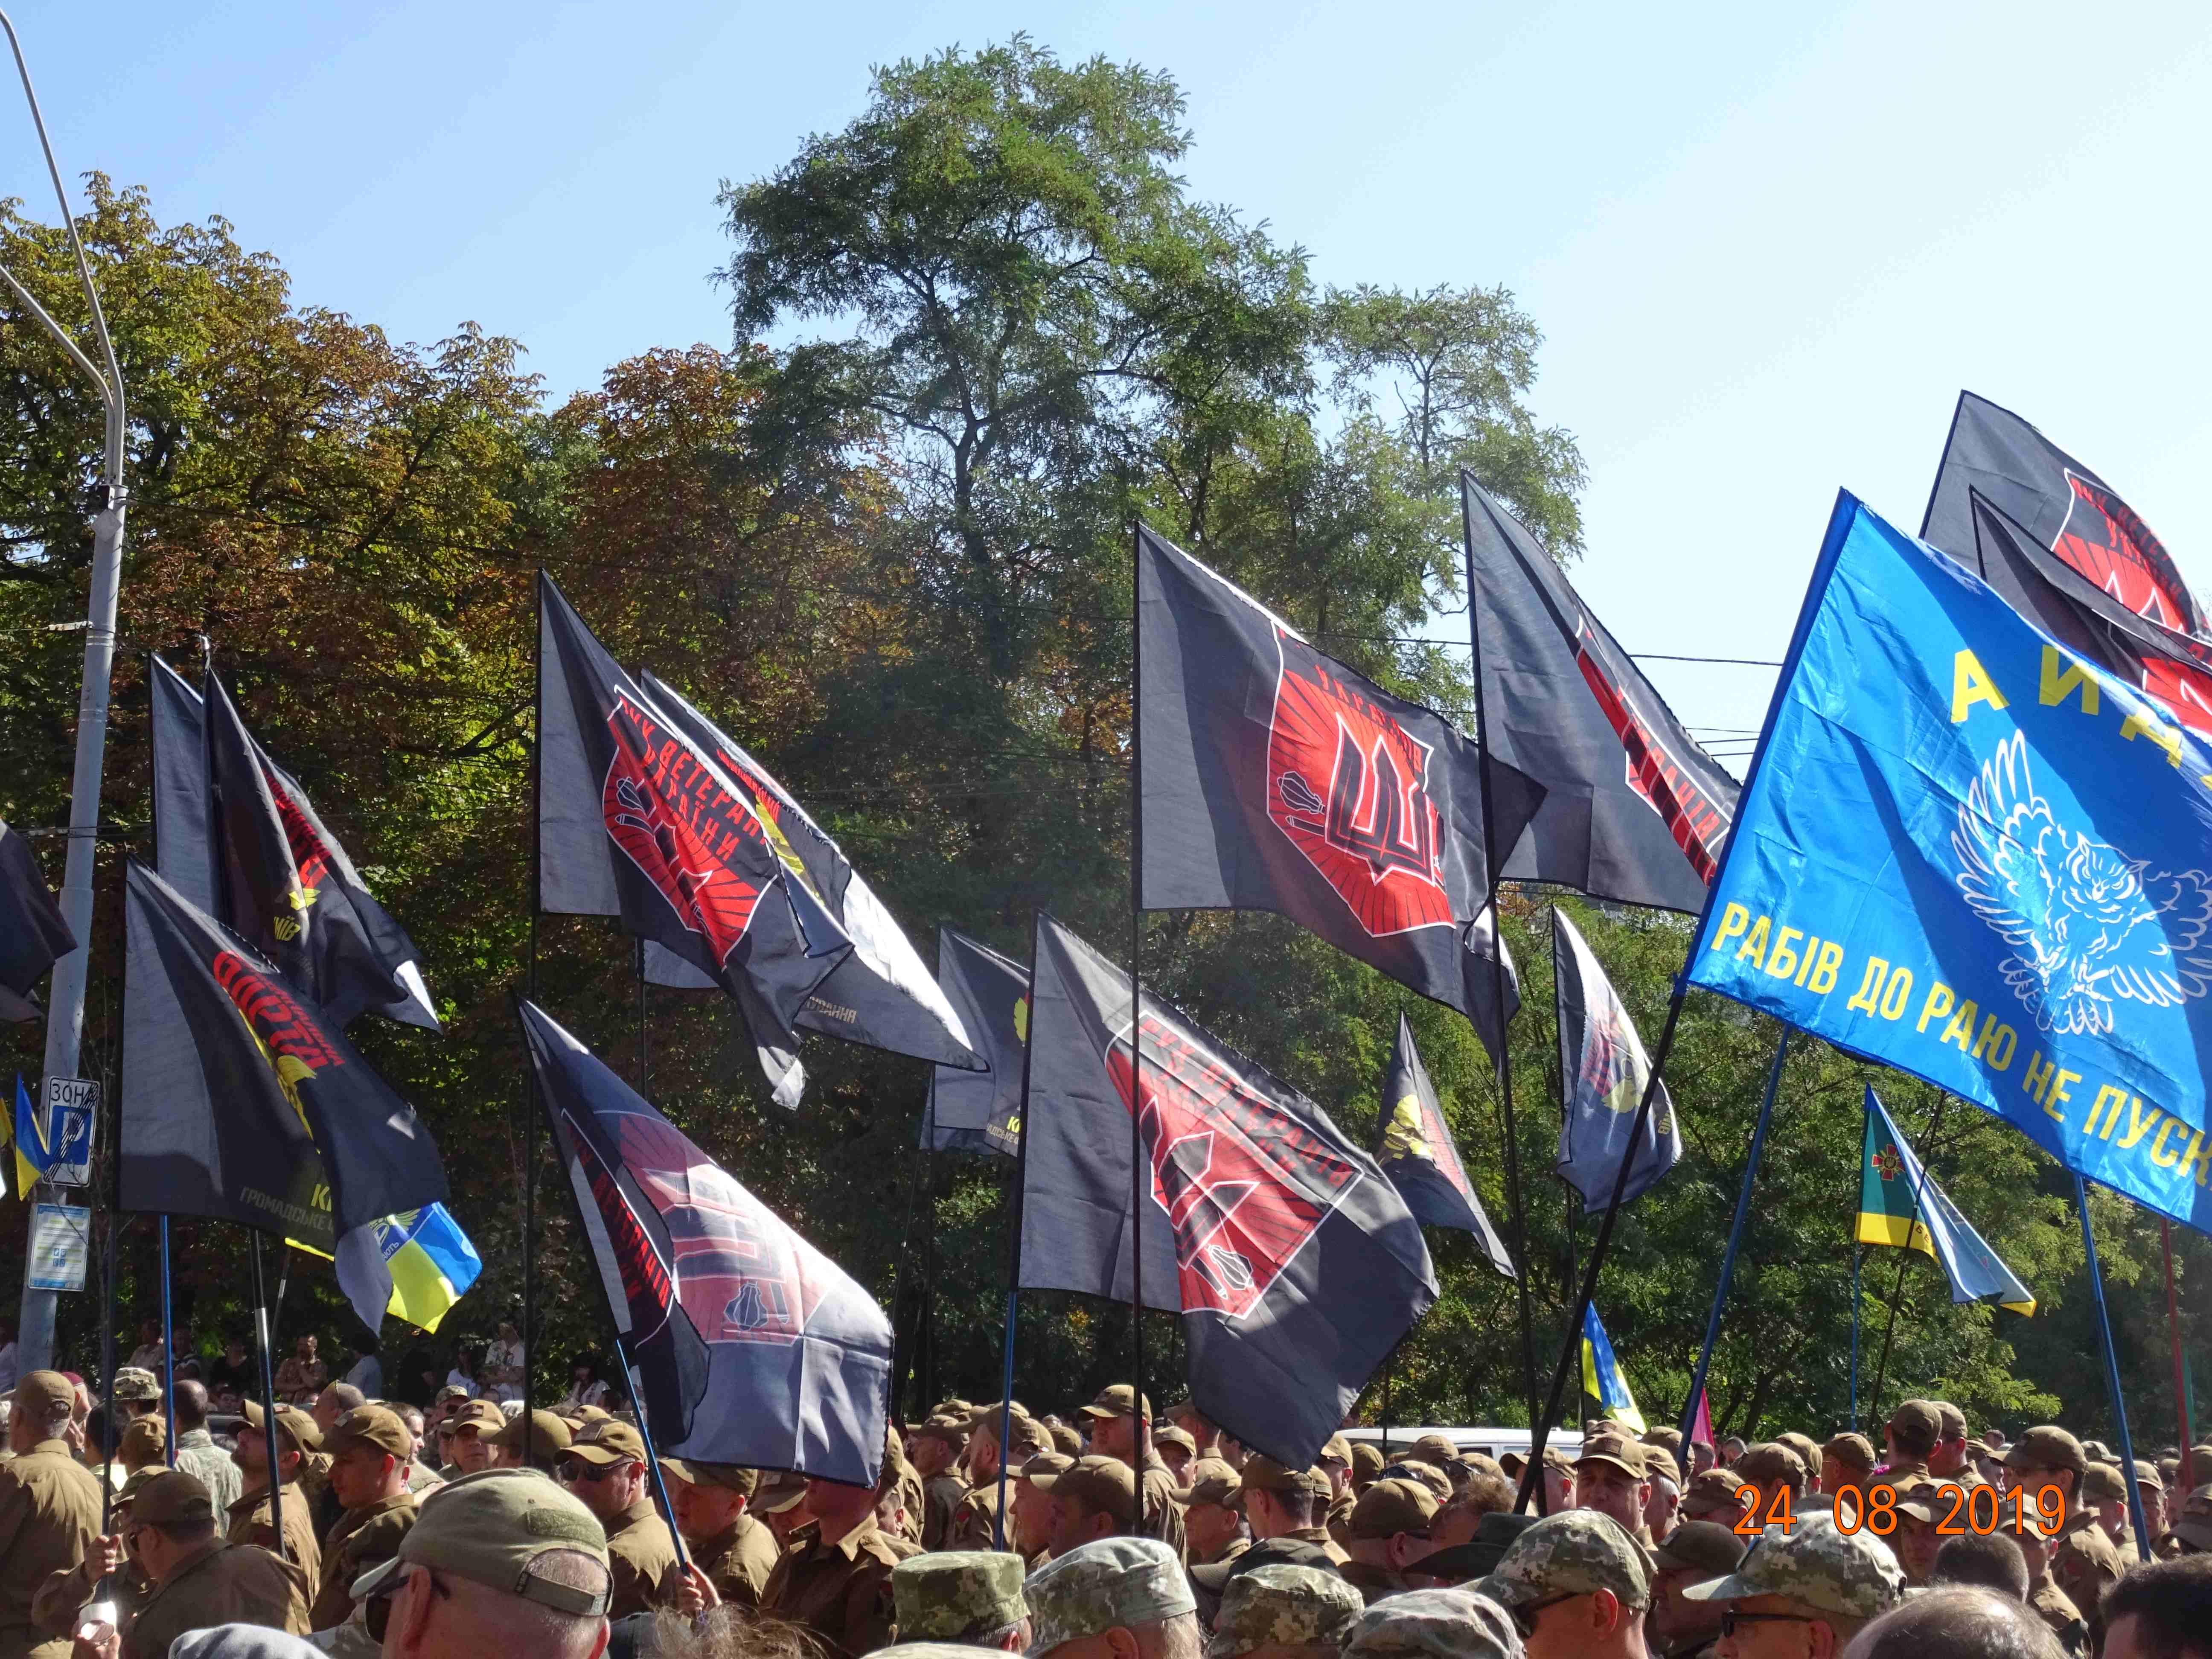 Defenders-of-Ukraine-Parad-24.Aug.19 - DSC05995.jpg